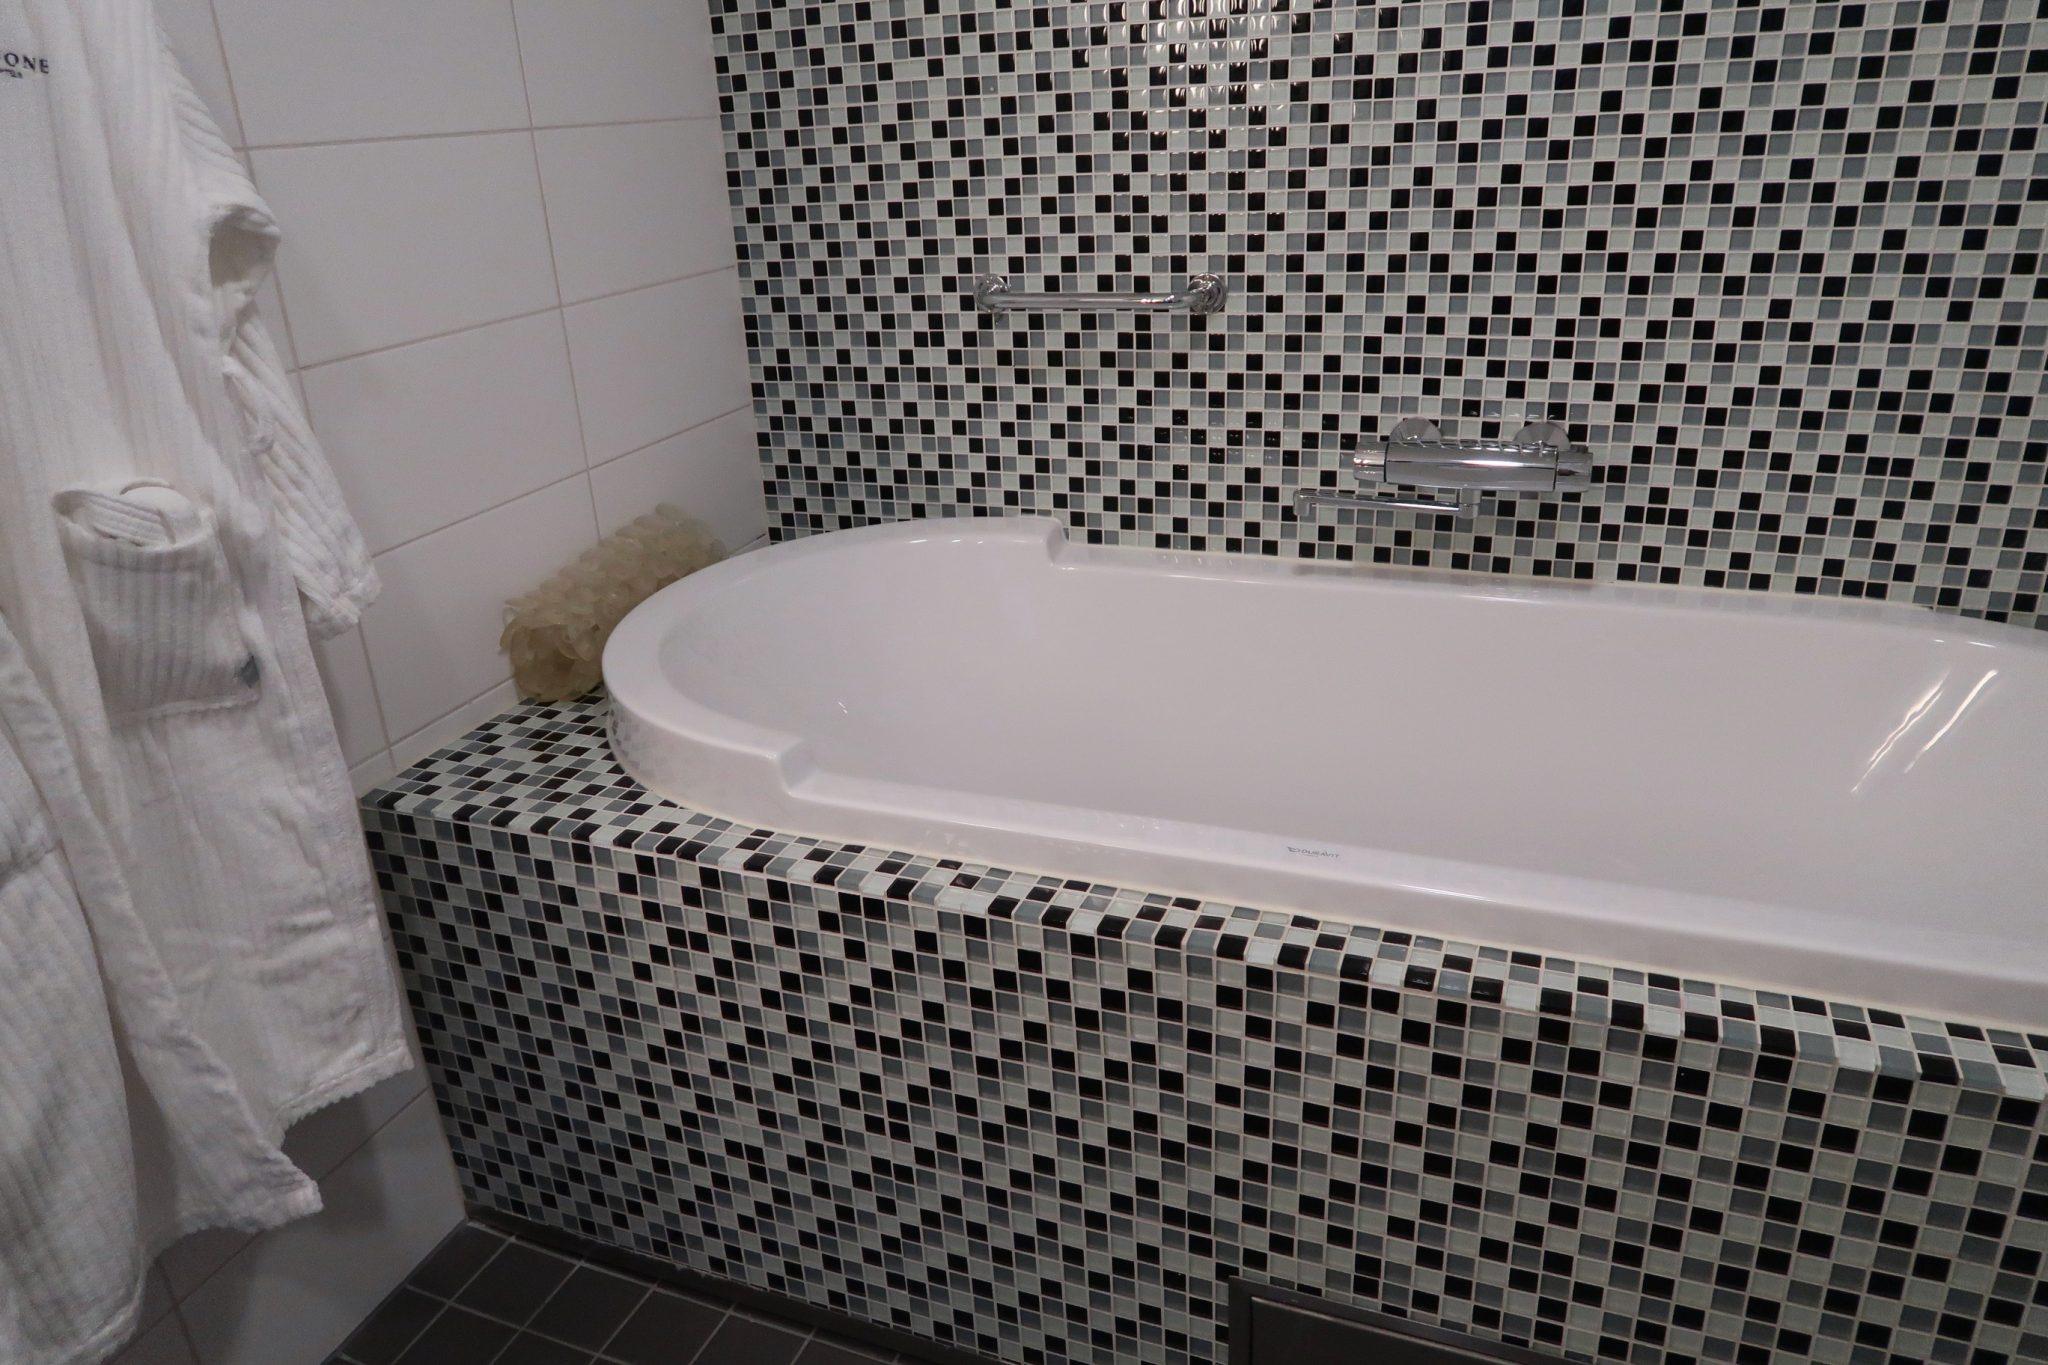 Lahden seurahuone kylpyamme